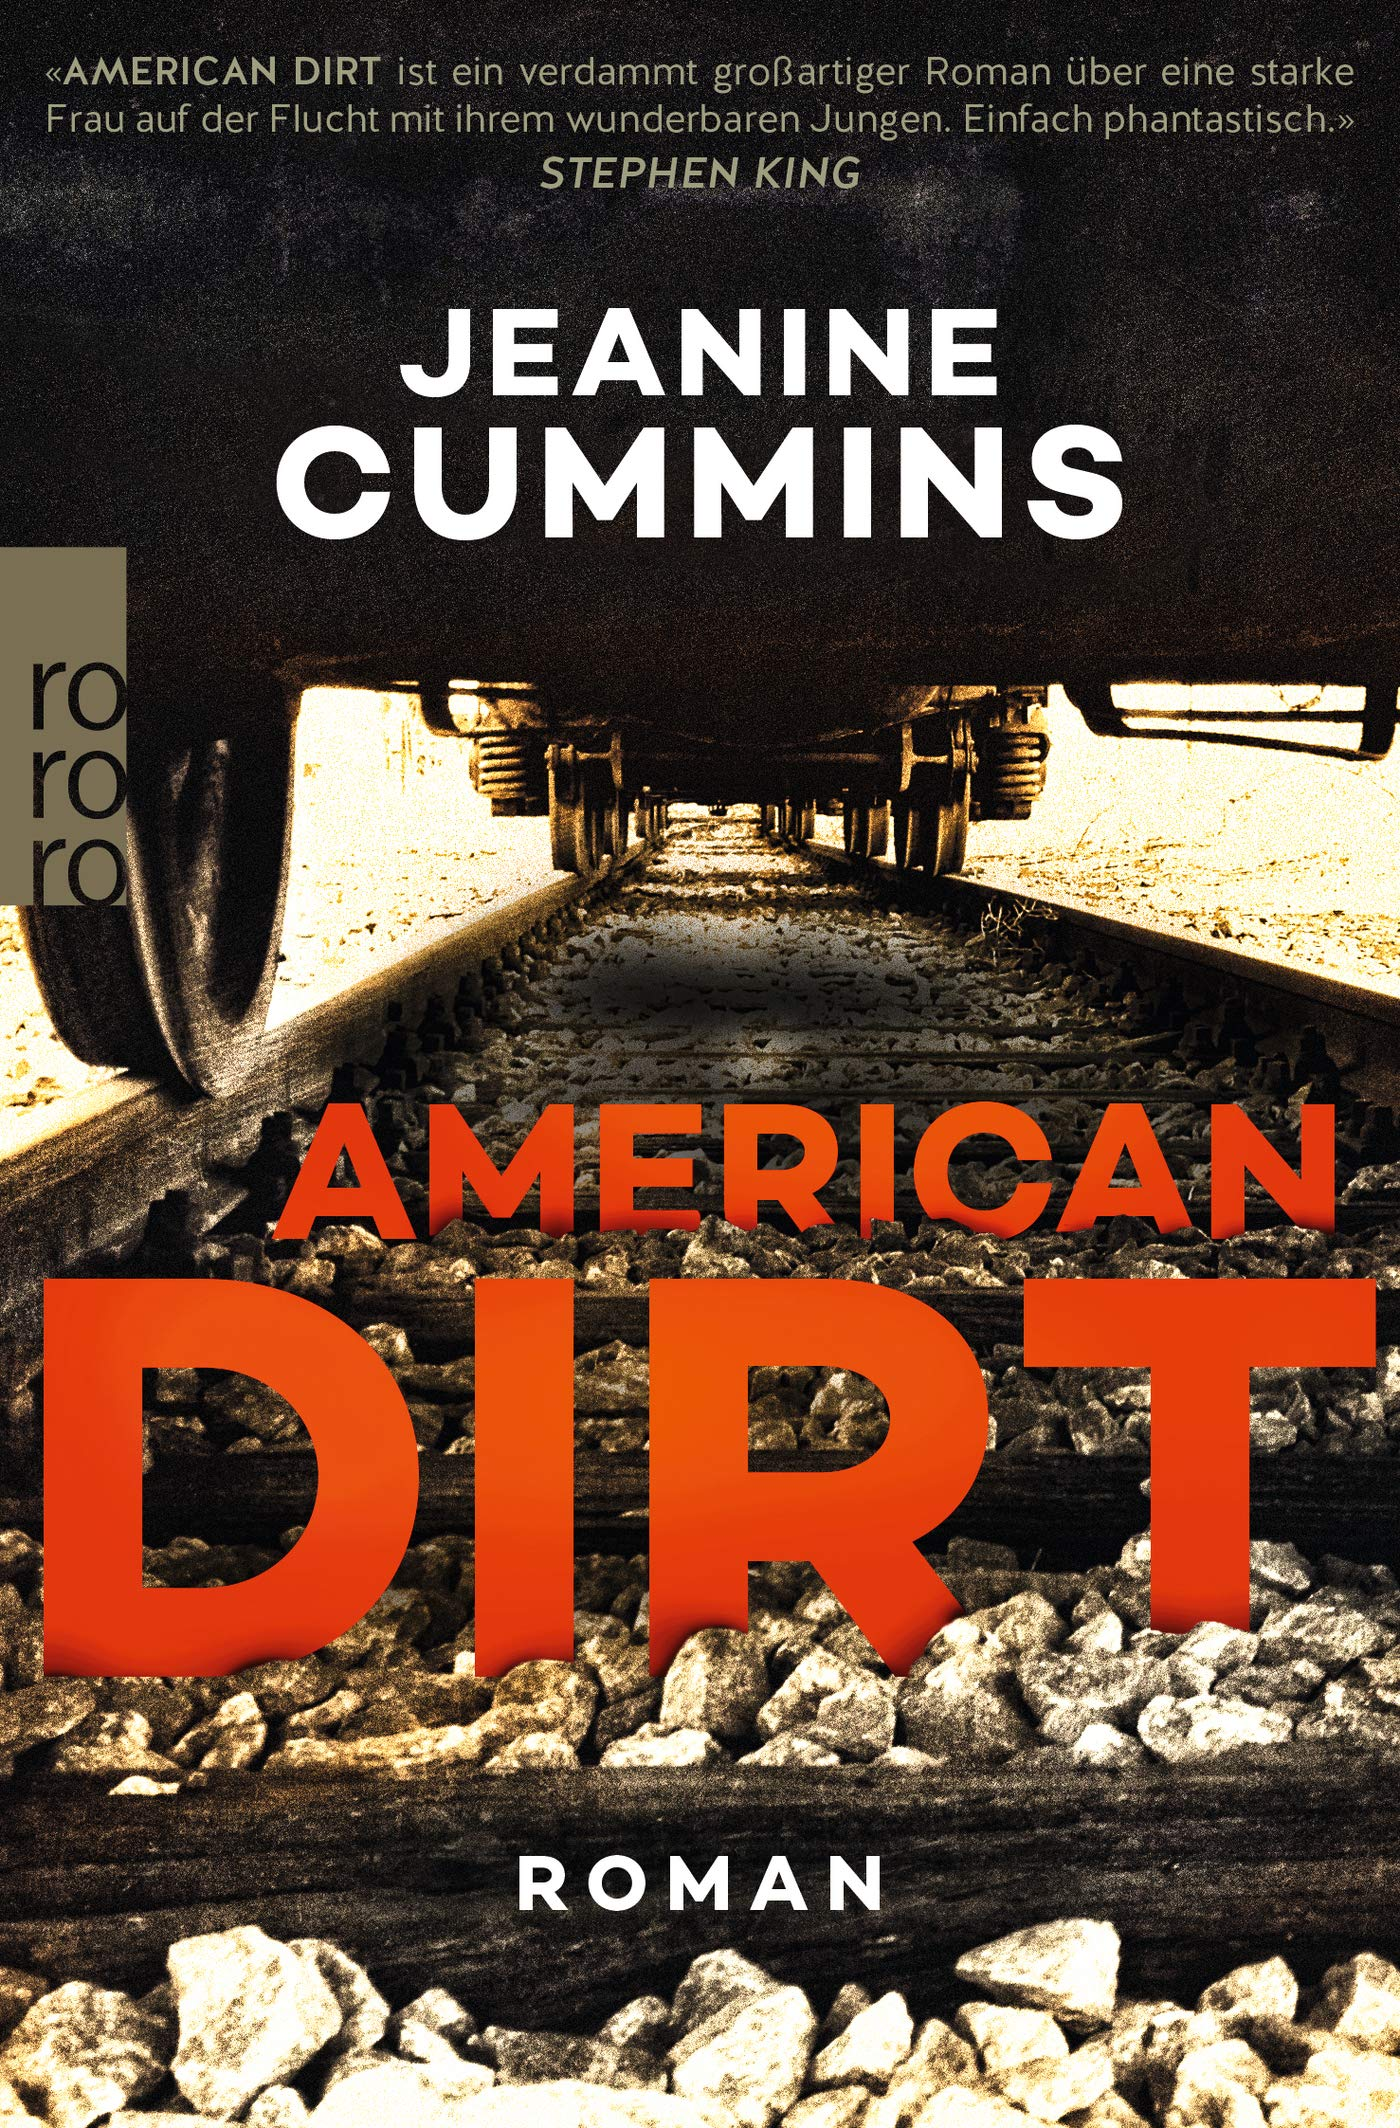 American Dirt: Cummins, Jeanine: 9783499276828: Amazon.com: Books